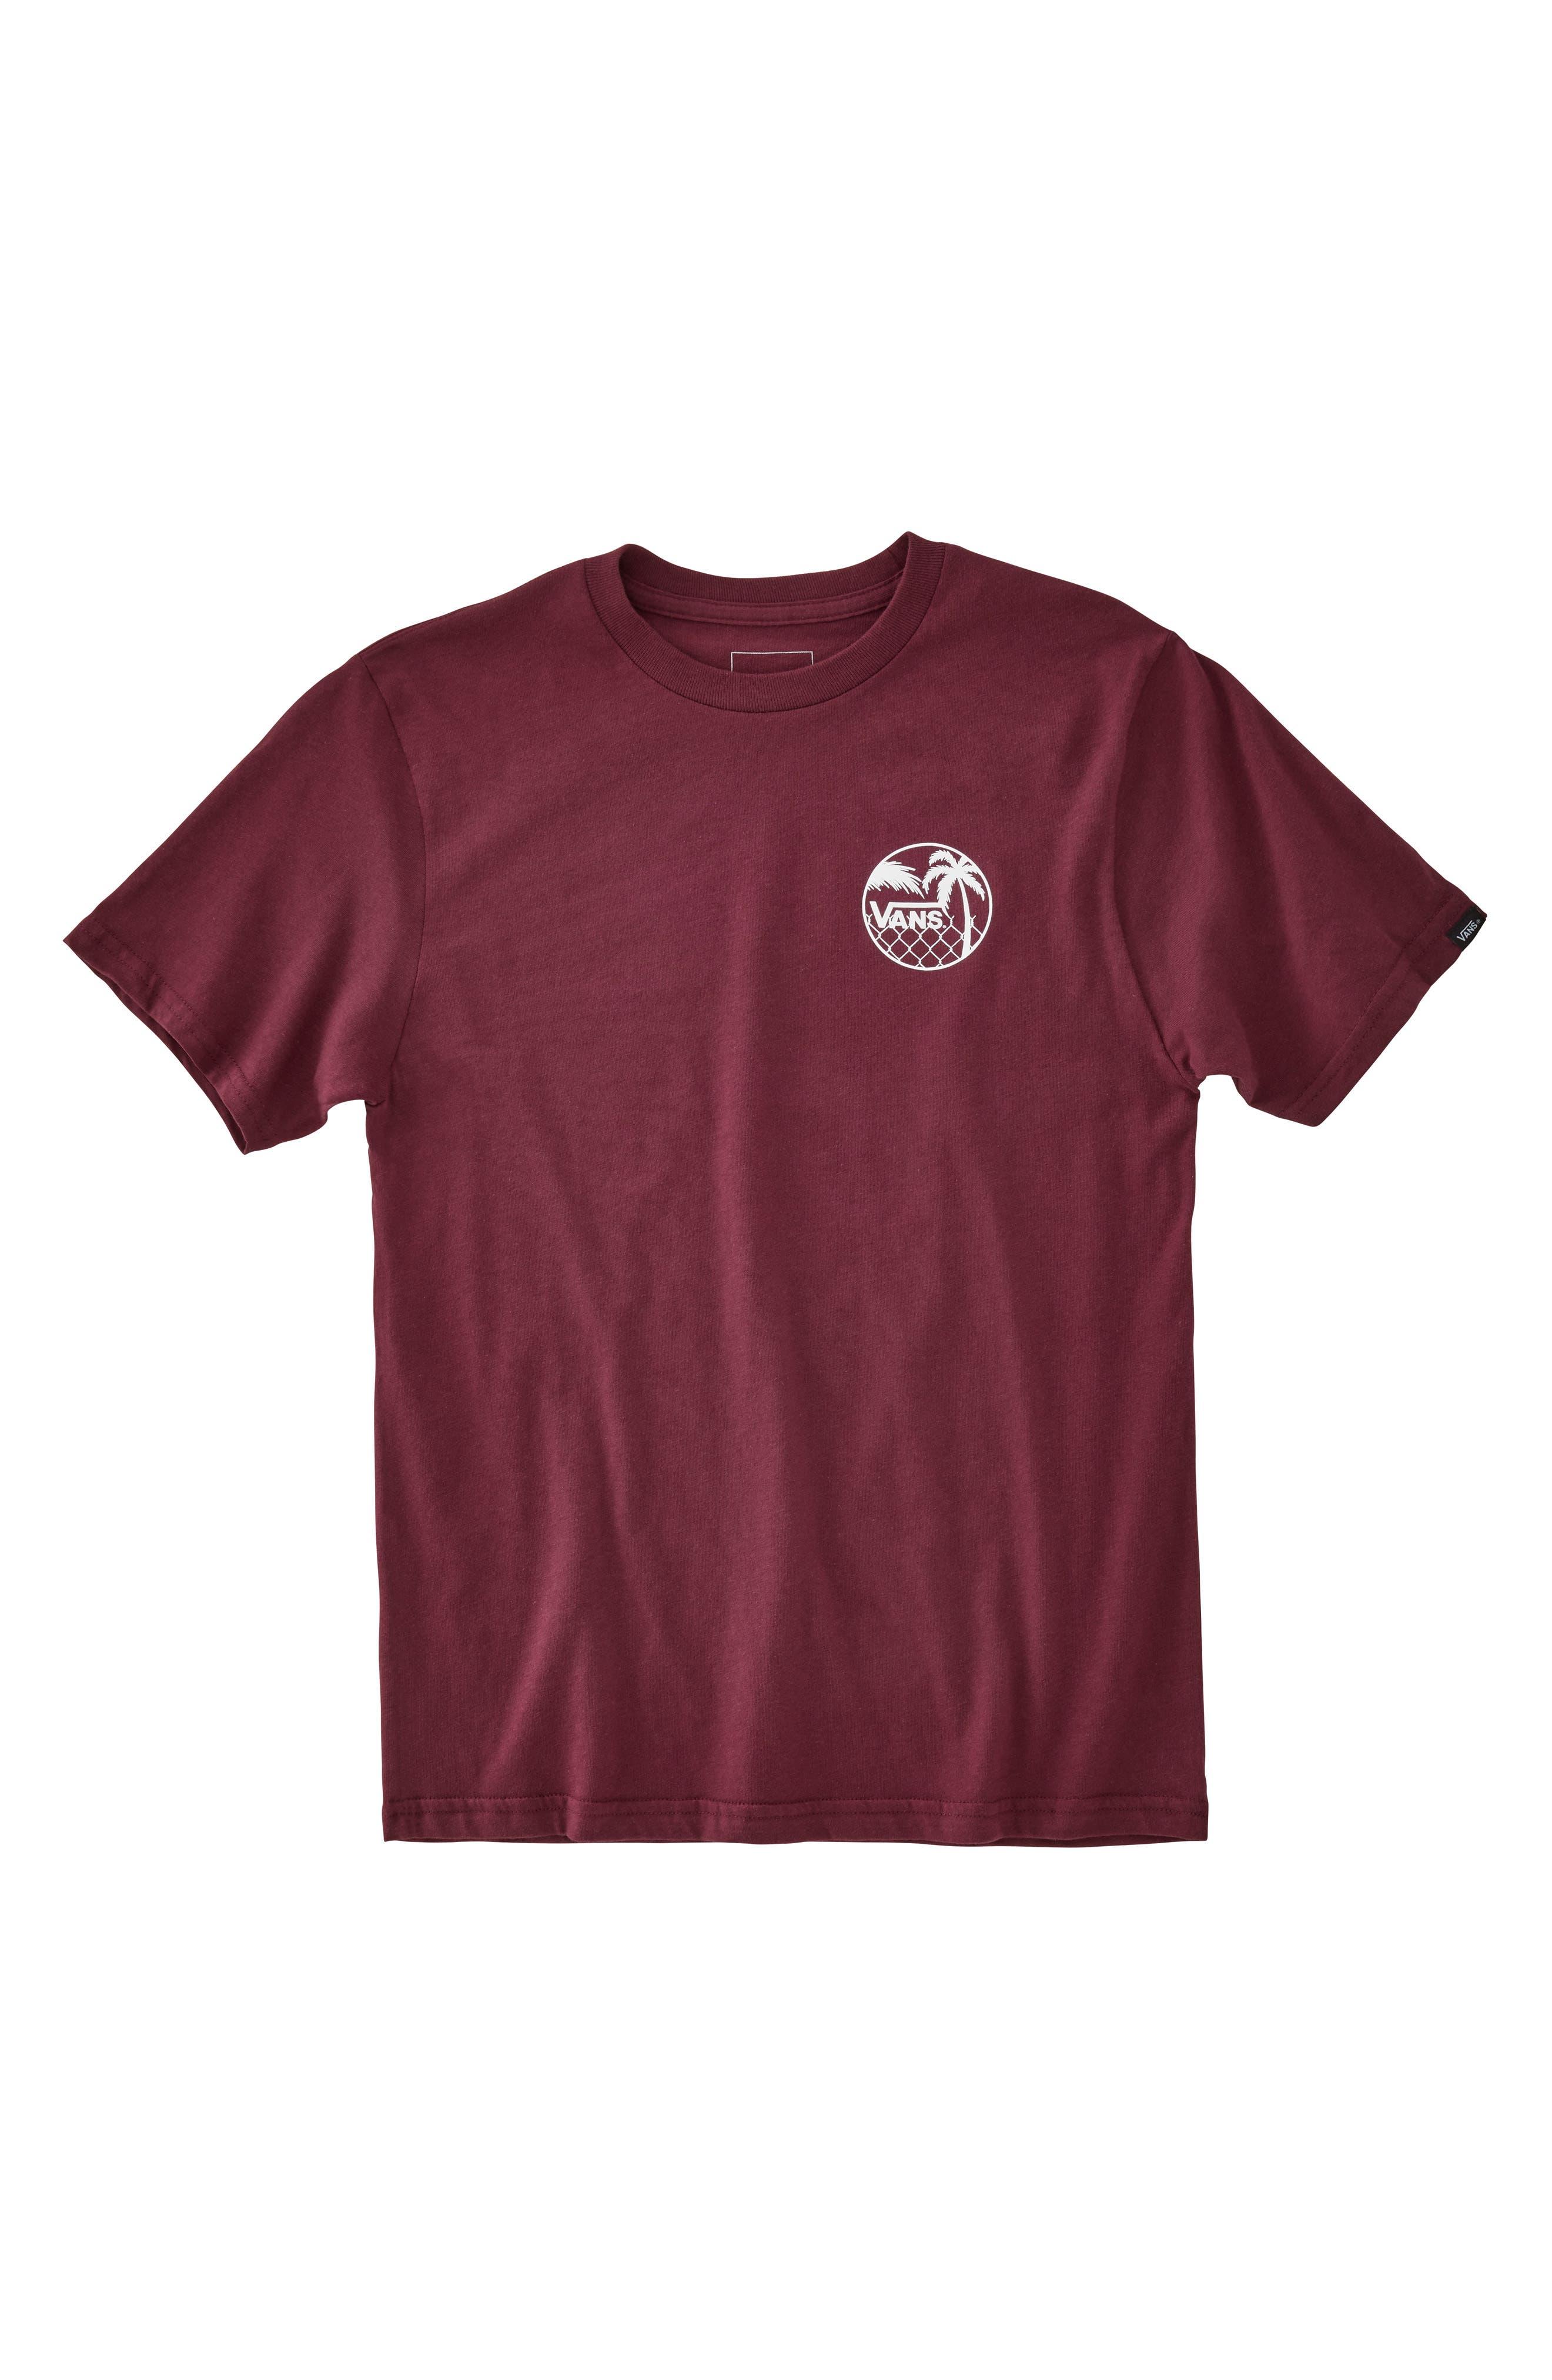 Chain Link Palm T-Shirt,                             Main thumbnail 1, color,                             BURGUNDY